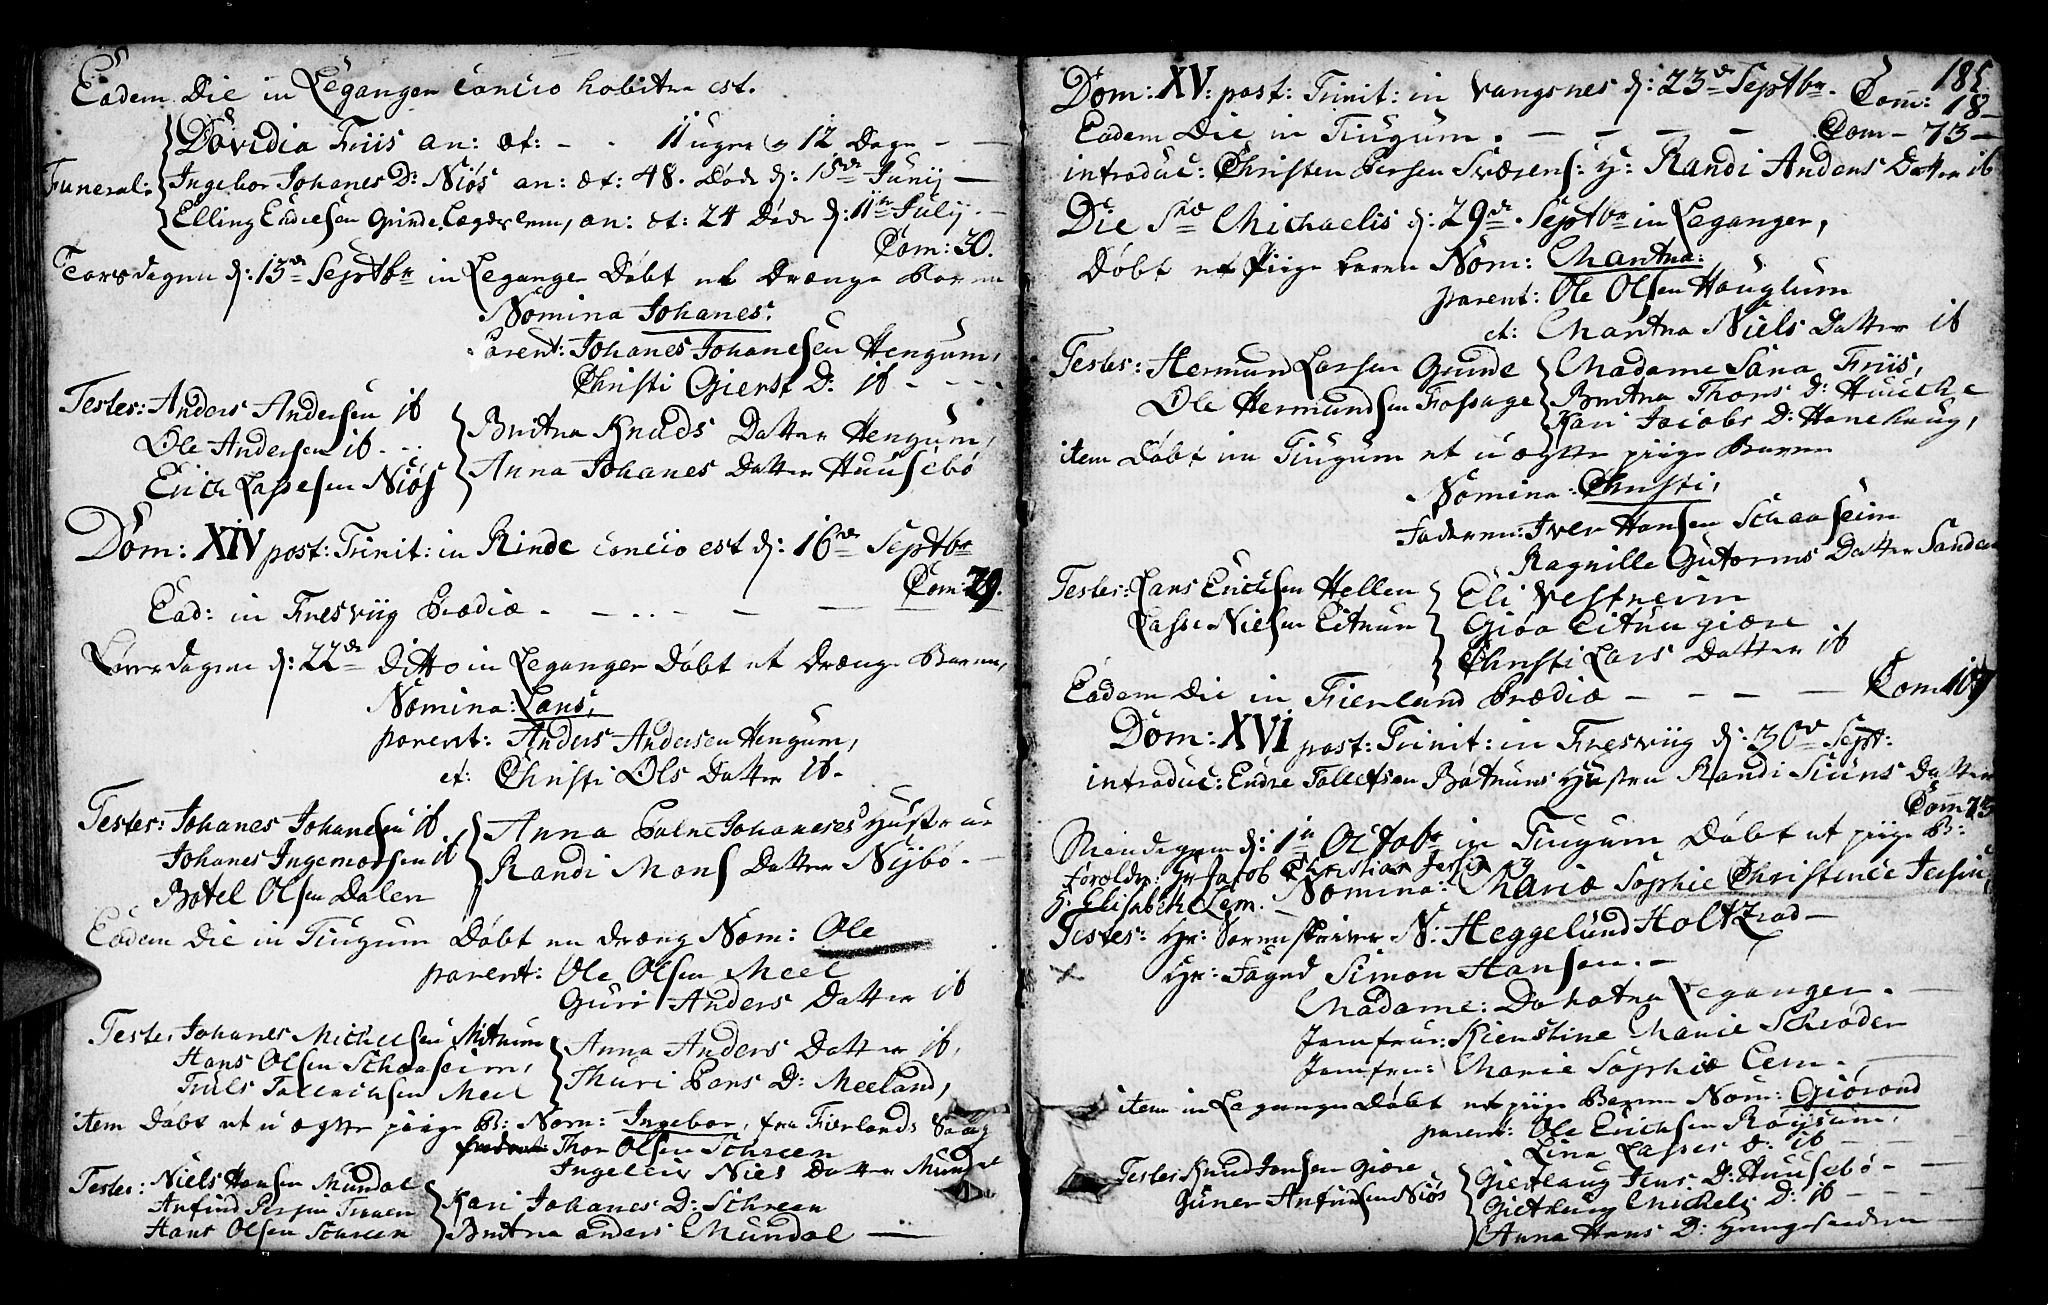 SAB, Leikanger Sokneprestembete, Ministerialbok nr. A 3, 1756-1770, s. 185